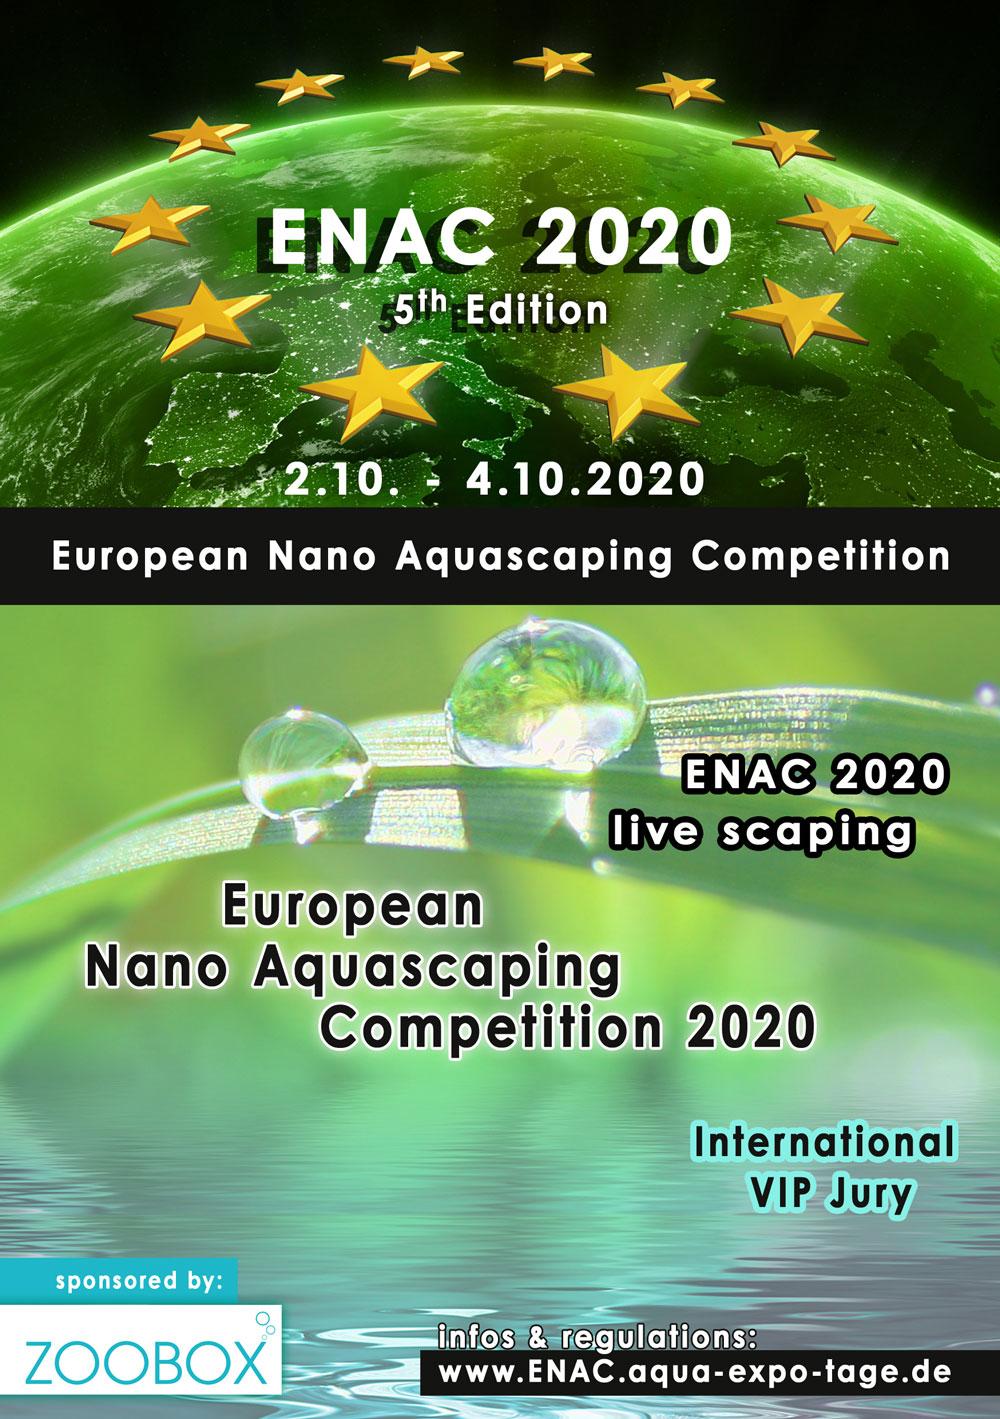 ENAC - European Nano Aquascaping Competition - 2020